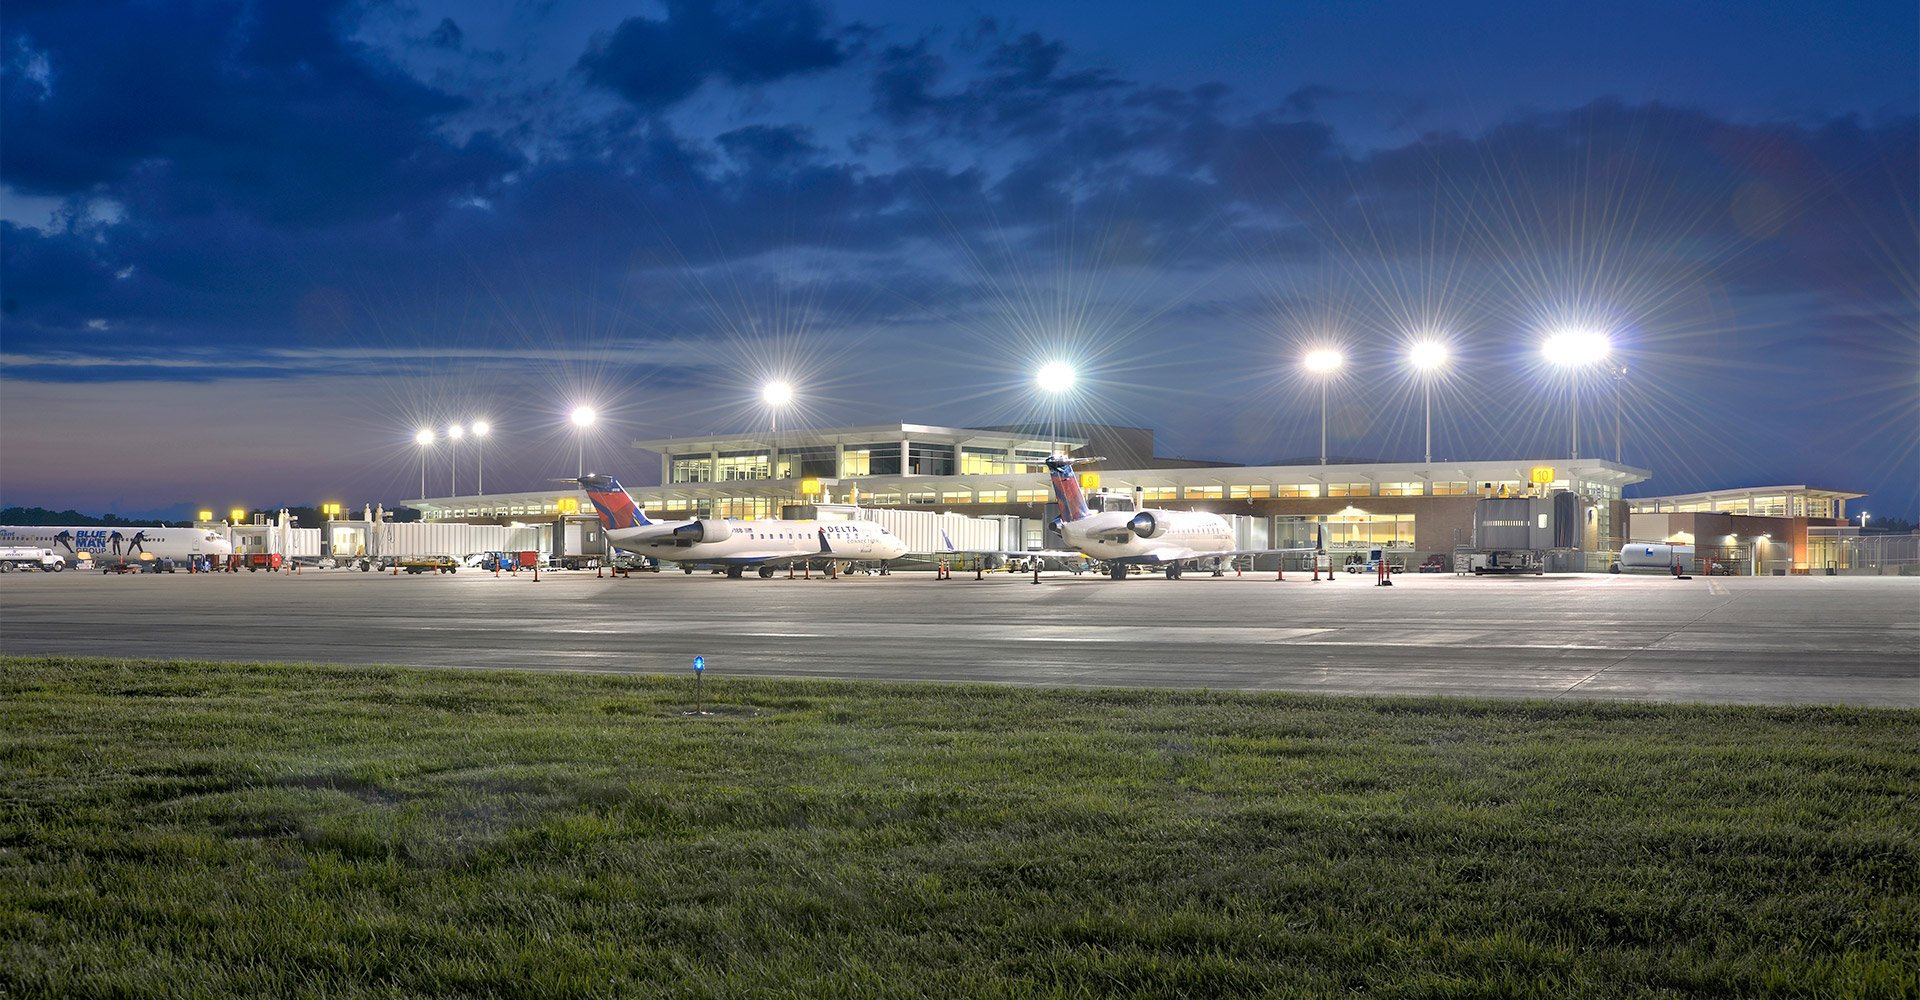 Exterior of Peoria International Airport at night.